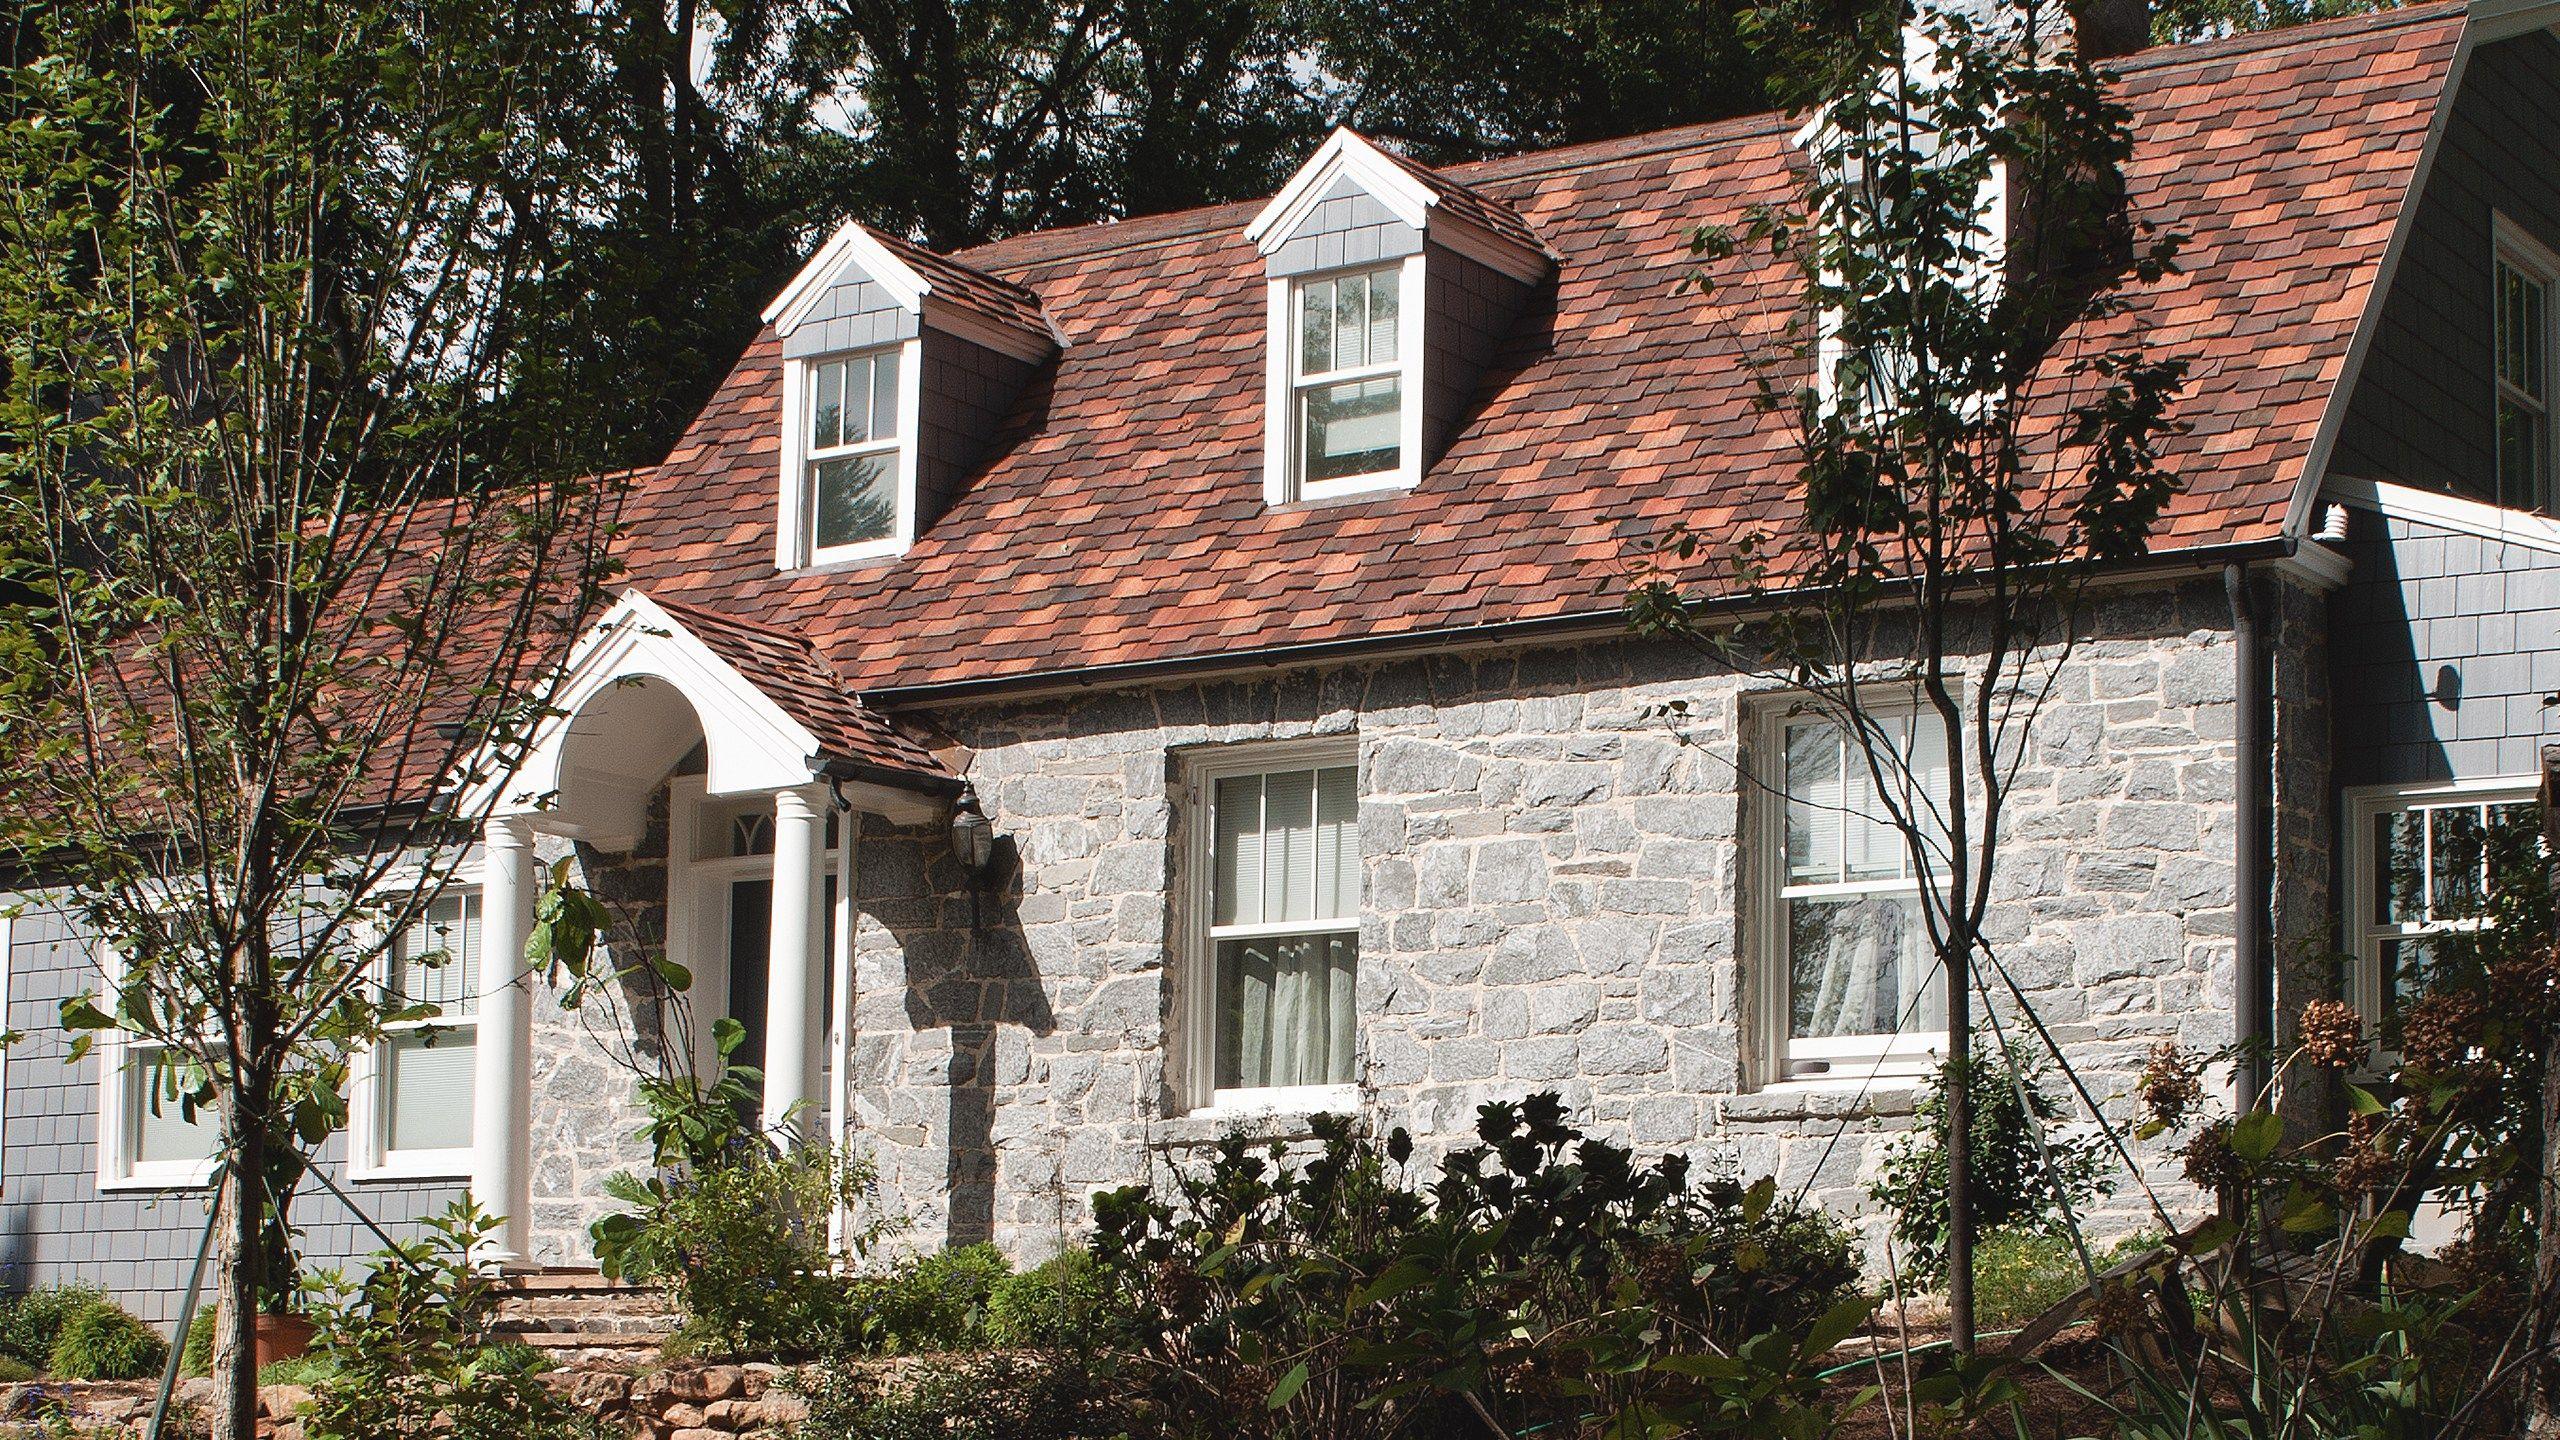 Ludowici Tile Roof Jpg 2560 1440 Cedar Roof Cedar Shingle Roof Roof Shingles